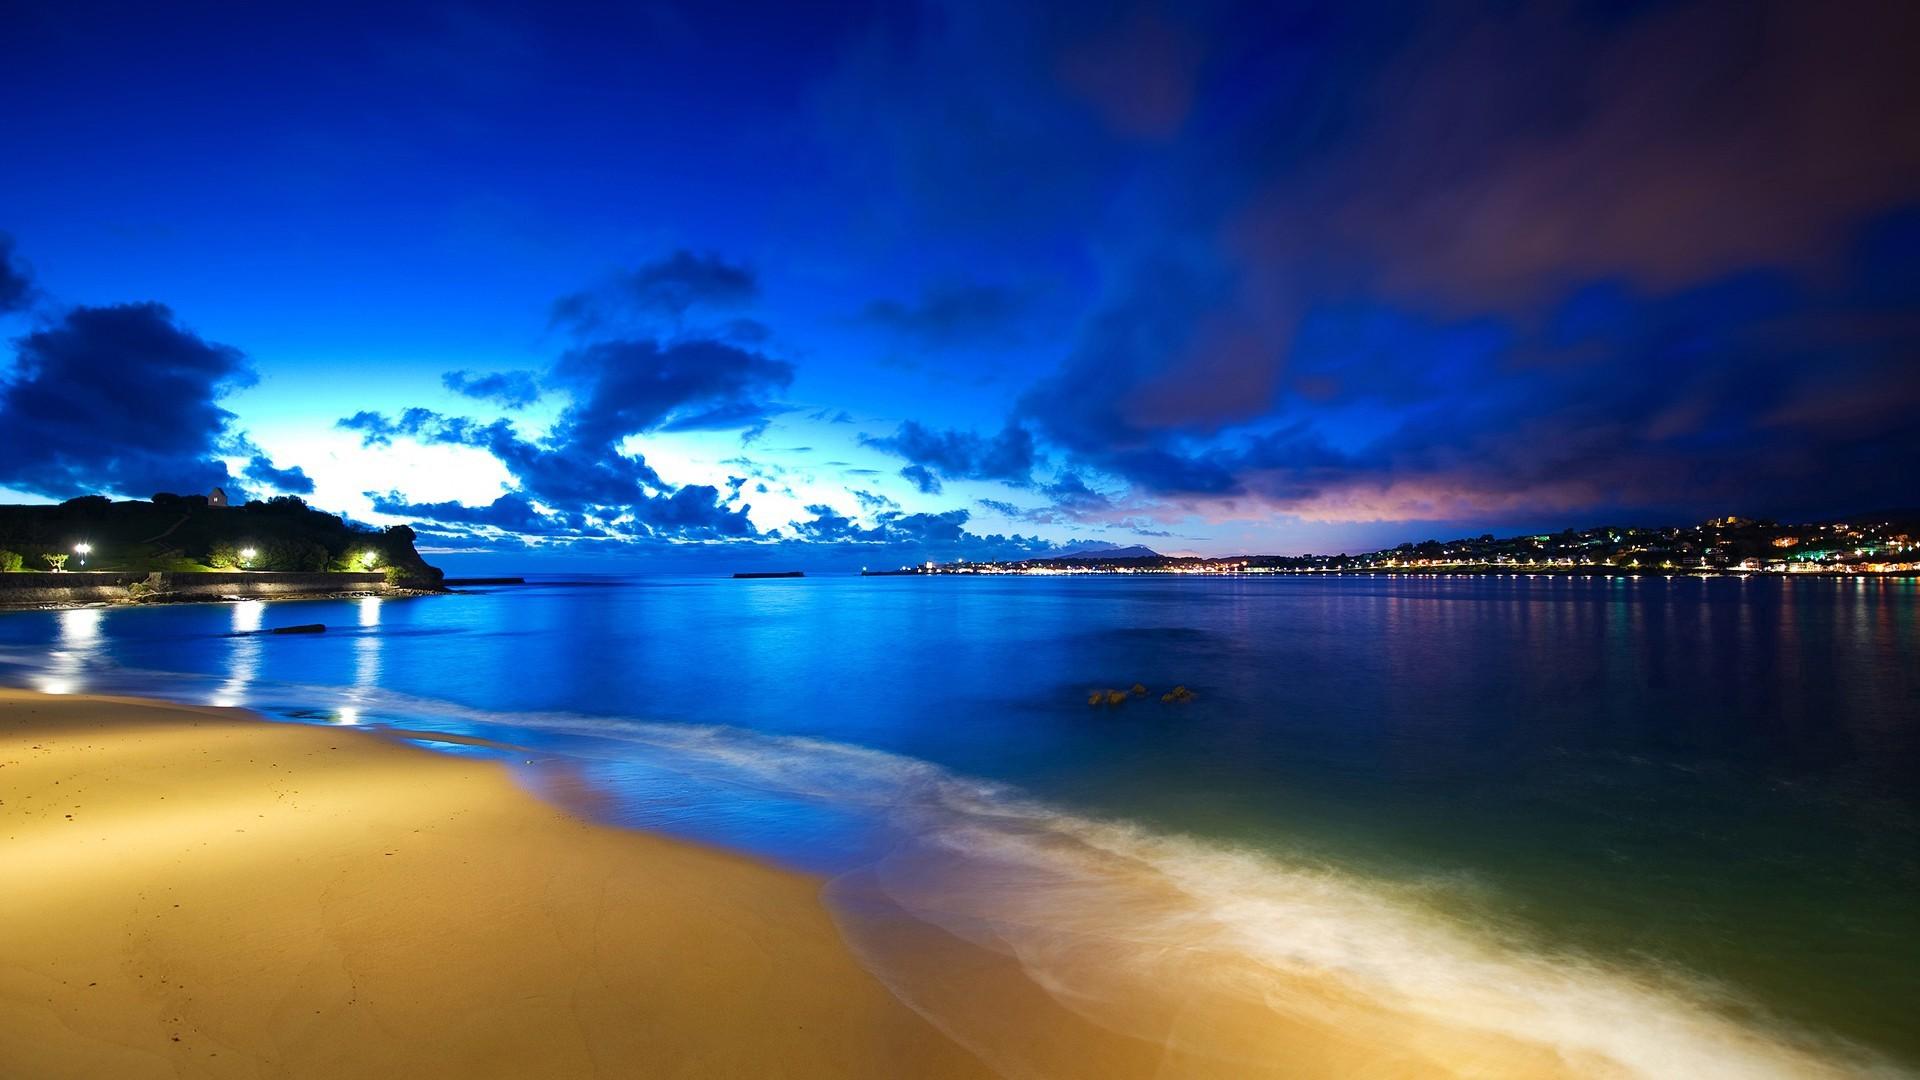 Ocean HD desktop wallpaper : Widescreen : Fullscreen : Mobile …    Download Wallpaper   Pinterest   Hd desktop and Wallpaper